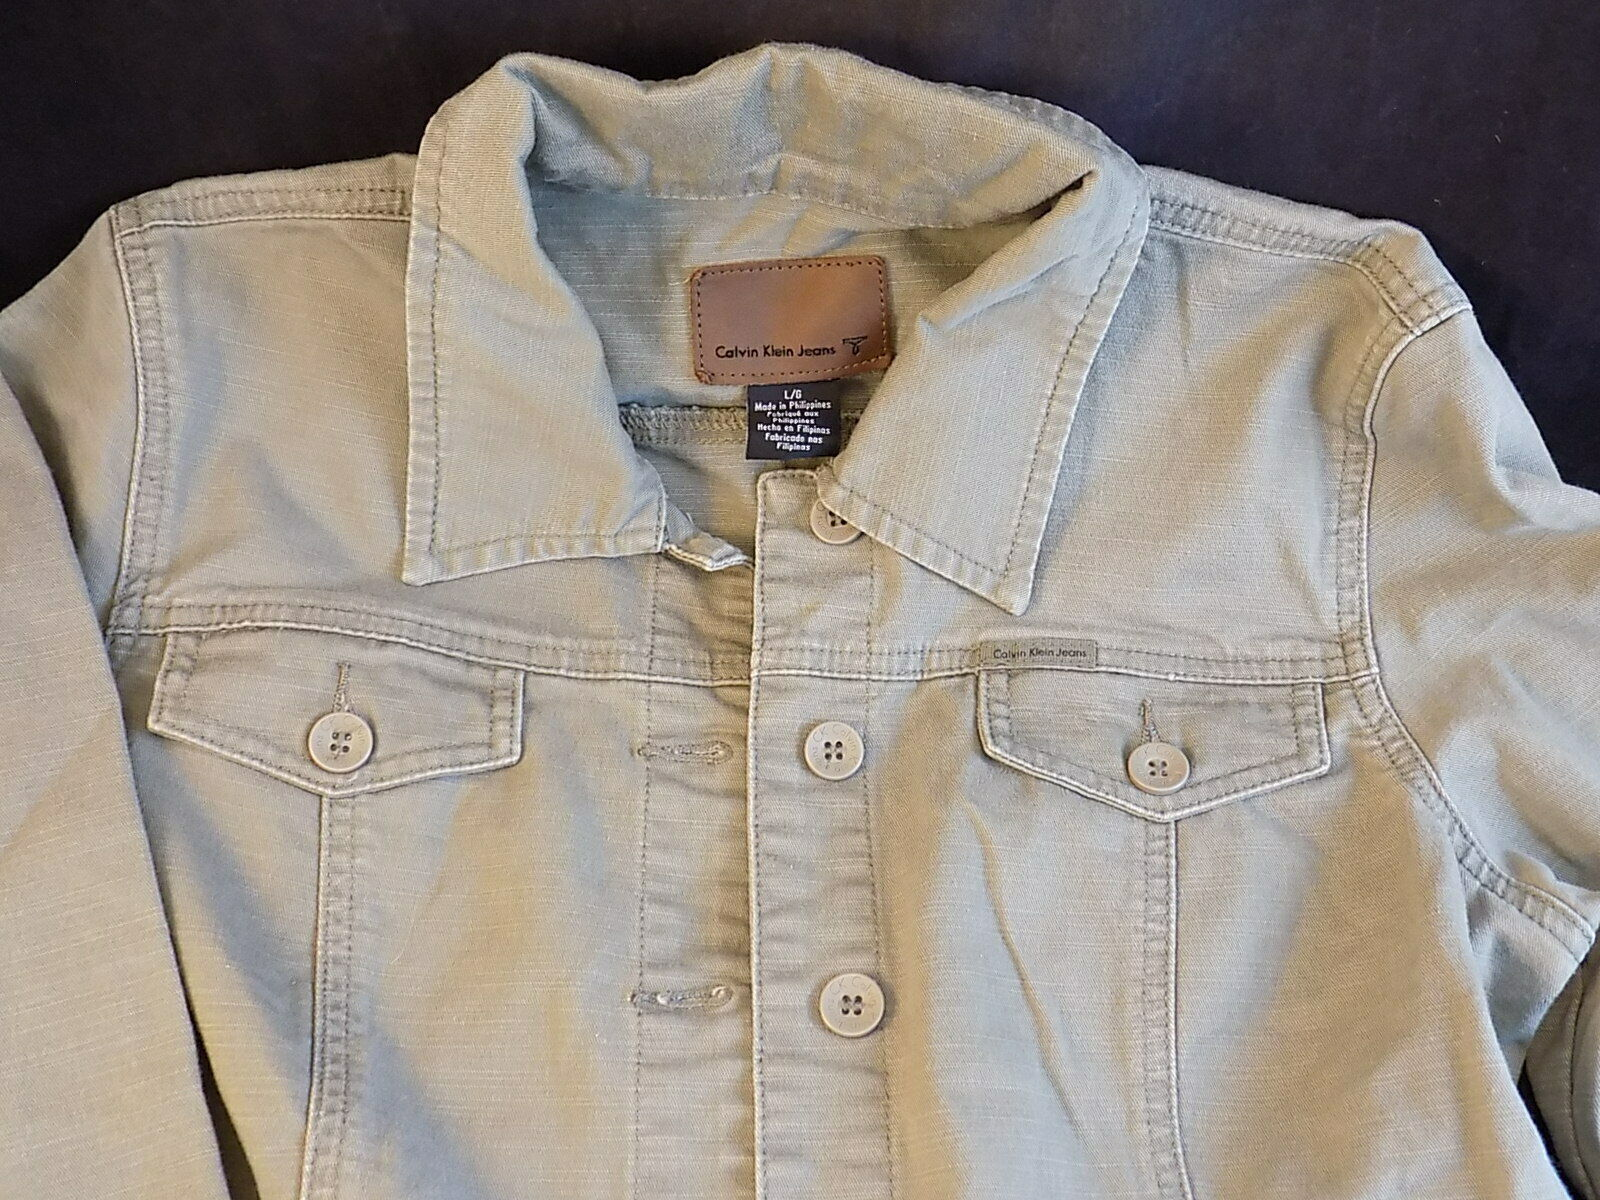 LADIES CALVIN KLEIN Green DENIM Jacket Size Large Style WB94J06